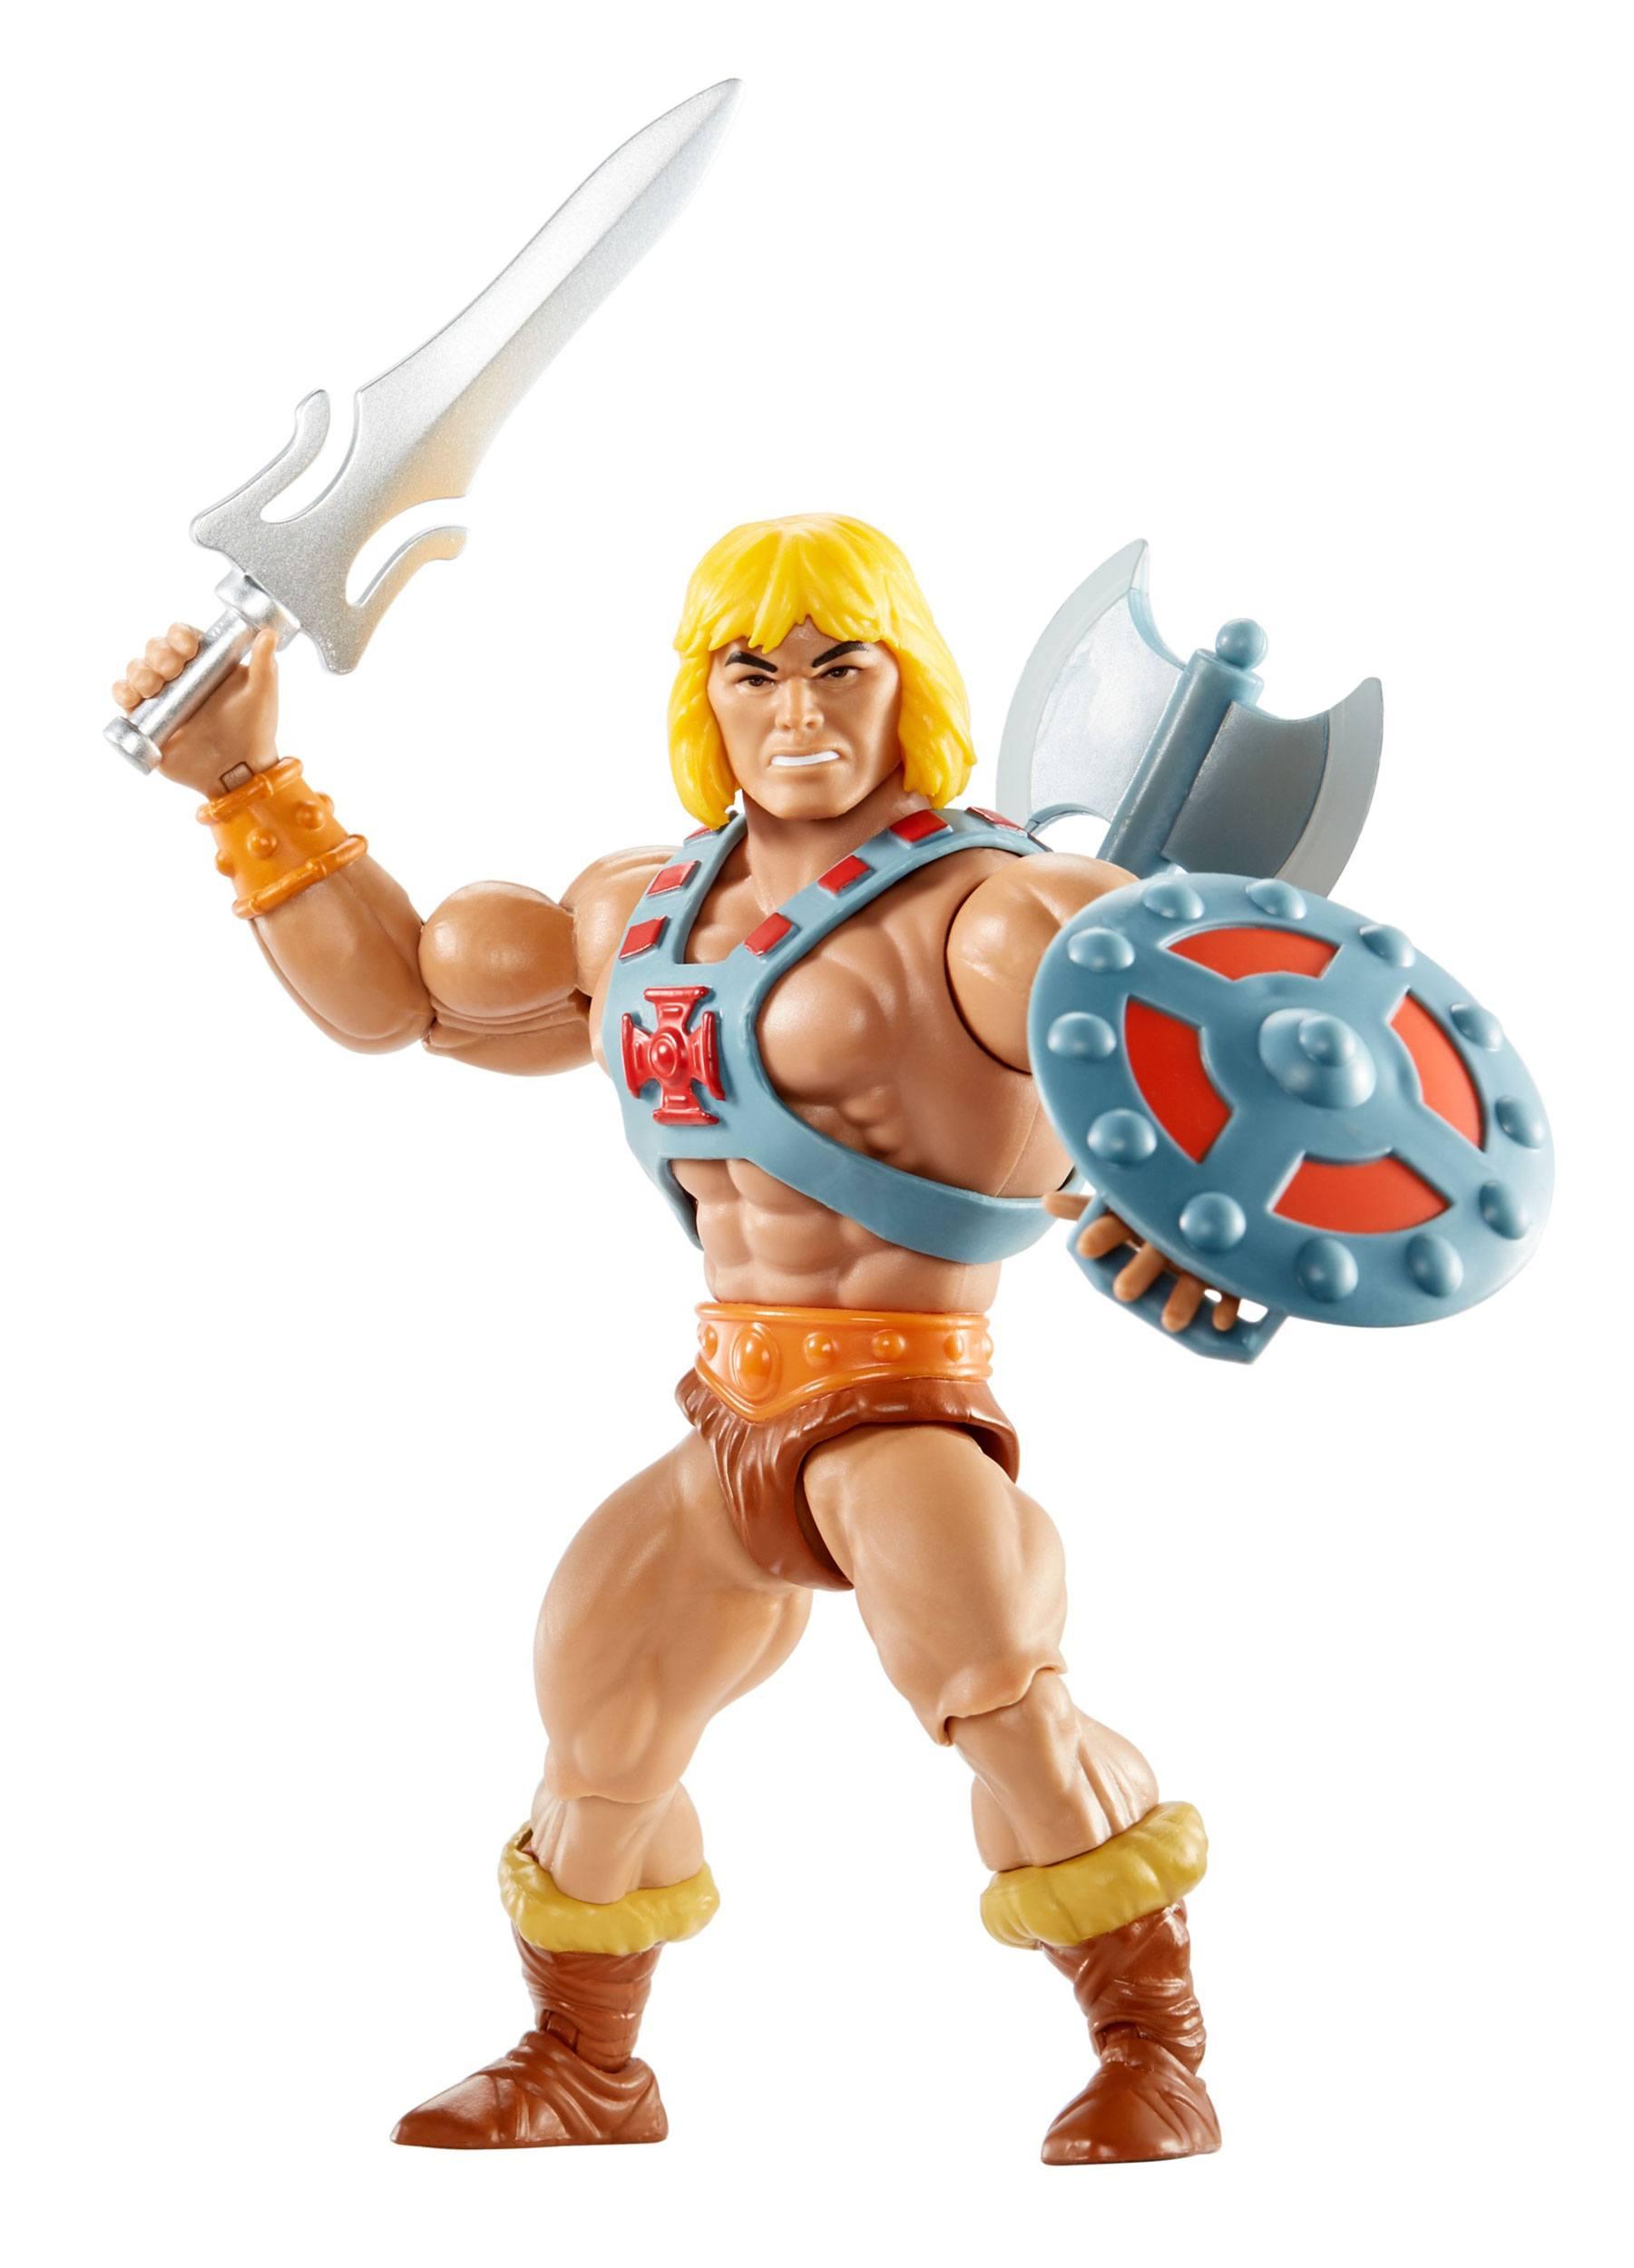 Masters of the Universe Origins Actionfigur 2021 He-Man 14 cm  MATTGNN85 887961875348